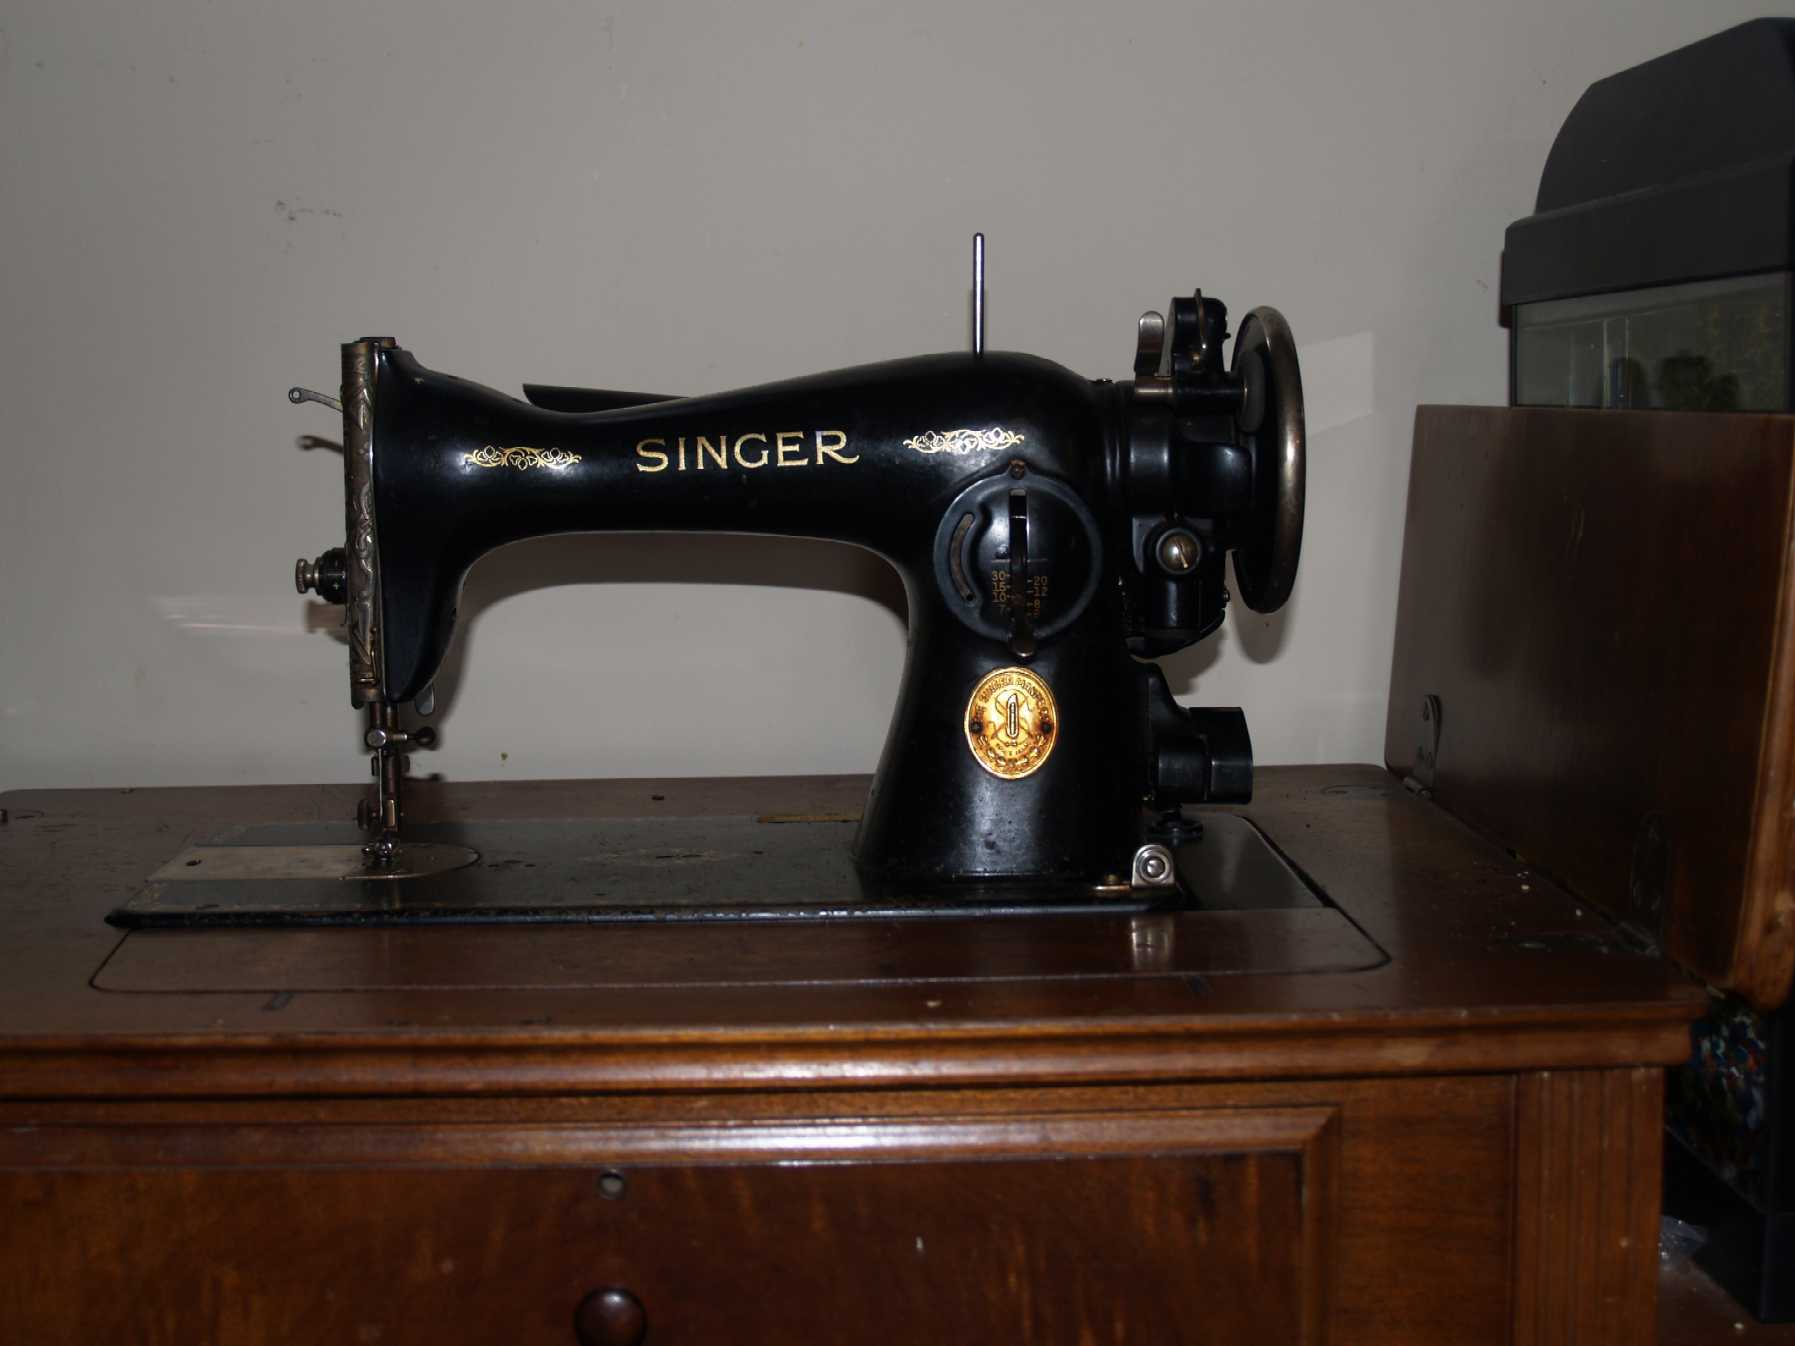 Aweinspiring Singer Machine I Think Sewing Machines Weblog Singer 15 91 Zigzag Attachment Singer 15 91 Needle Size houzz 01 Singer 15 91